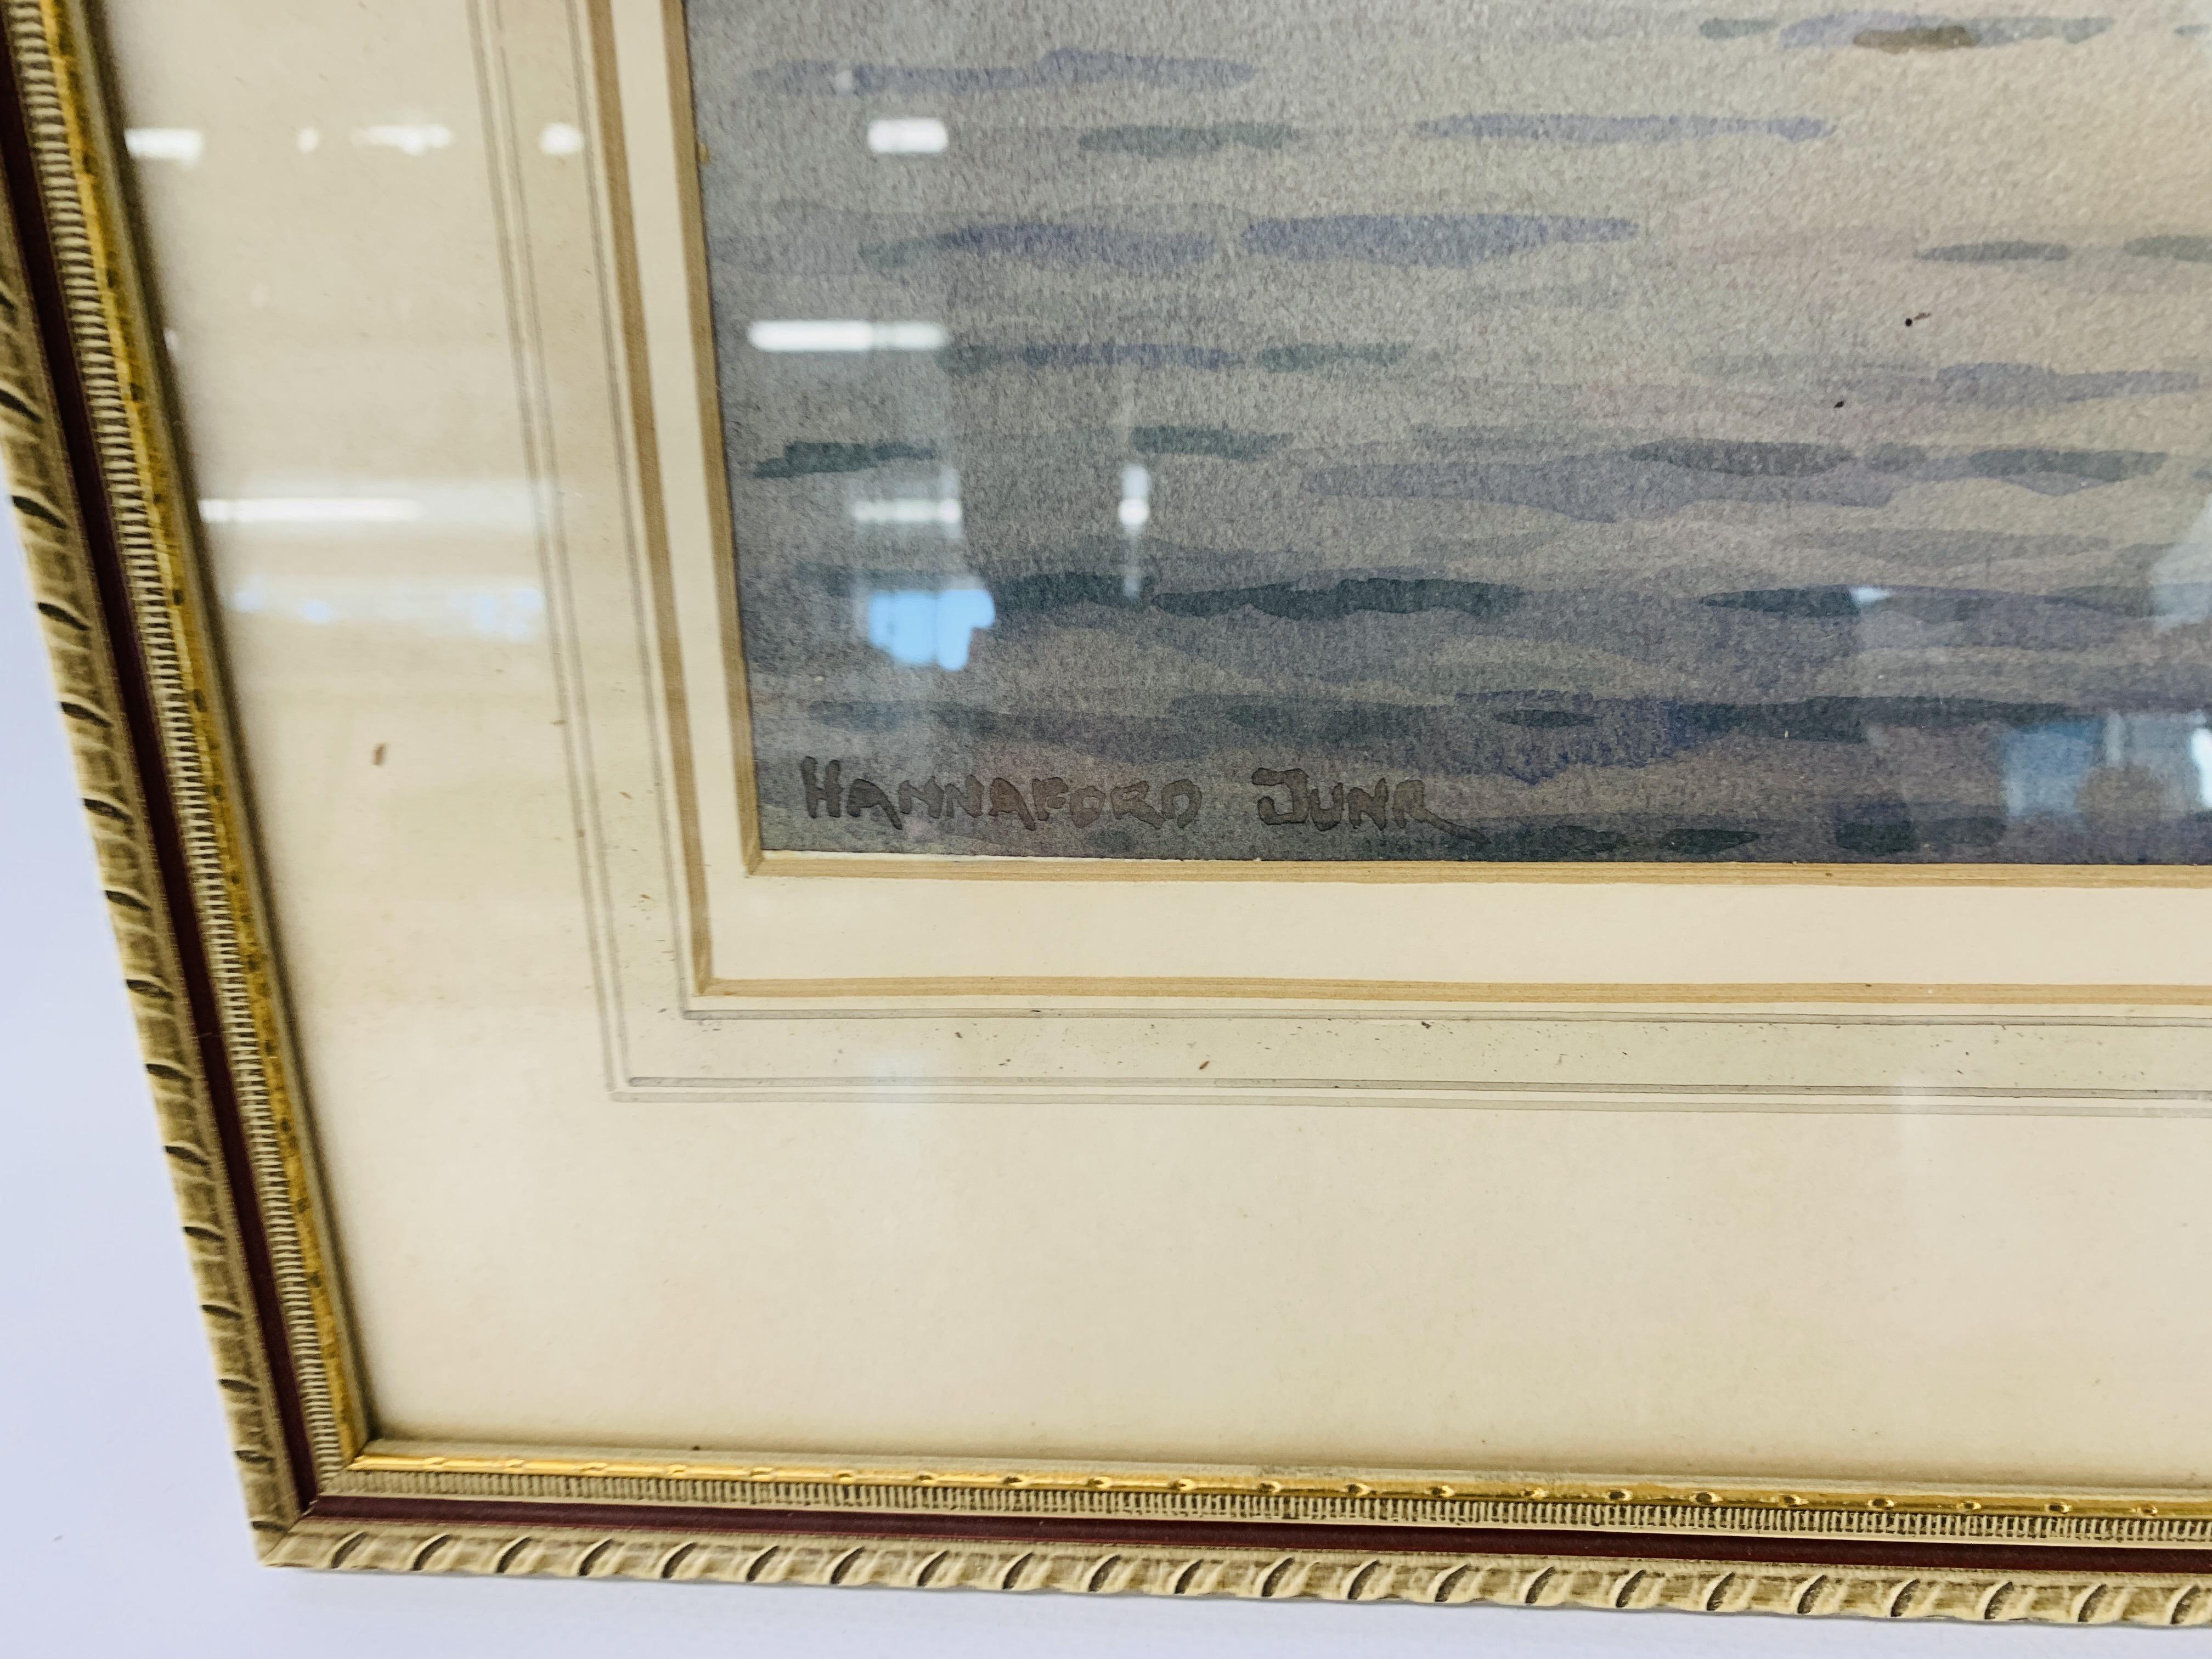 "A FRAMED WATERCOLOUR ""BEYOND REPAIR"" BEARING SIGNATURE HANNAFORD JUNIOR - 33.5 X 42.5 CM. - Image 9 of 11"